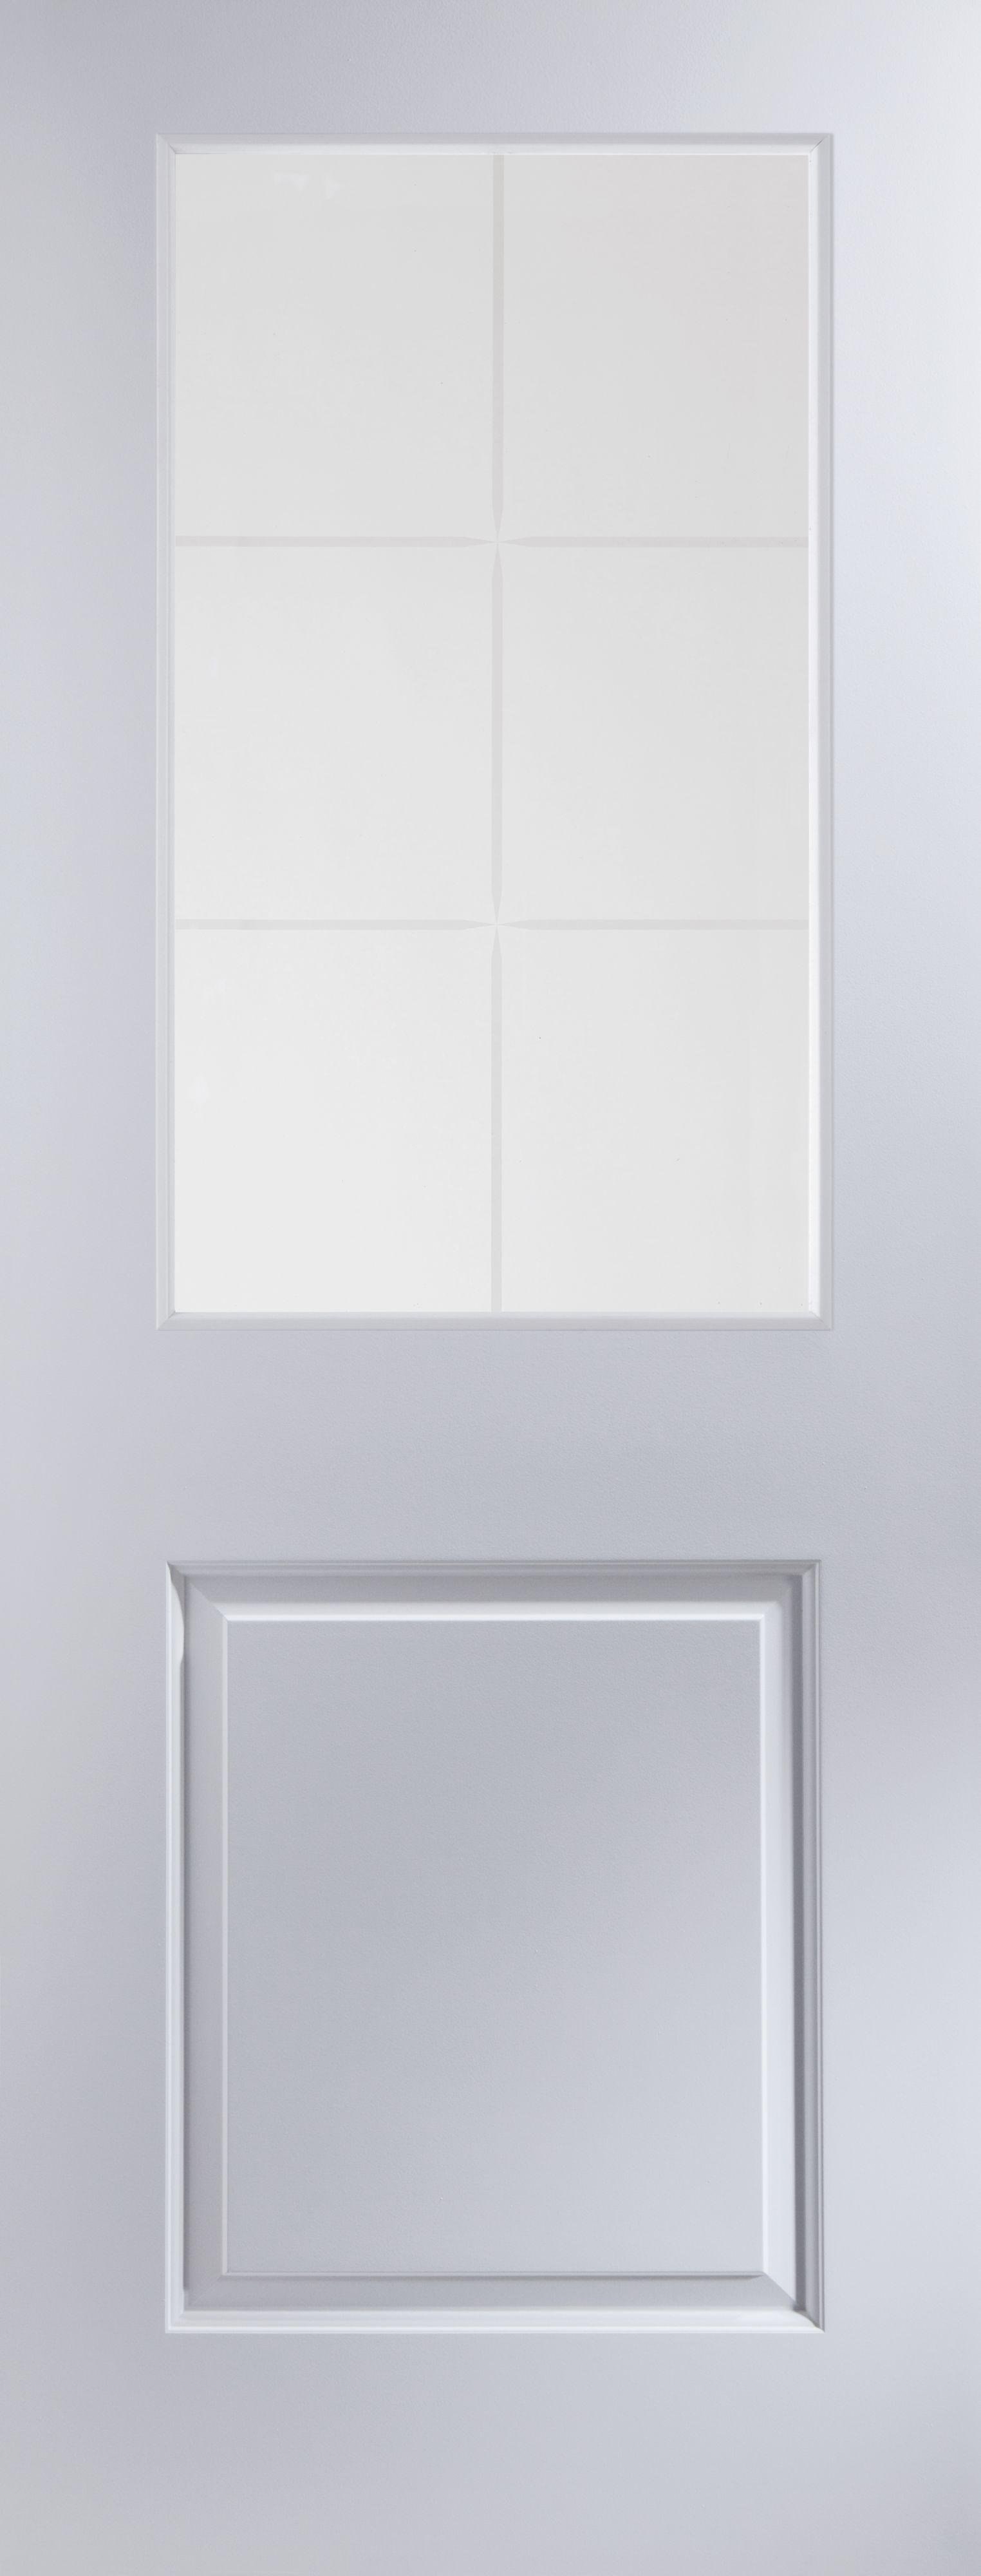 2 Panel 6 Lite Pre-painted White Glazed Internal Standard Door, (h)1981mm (w)762mm